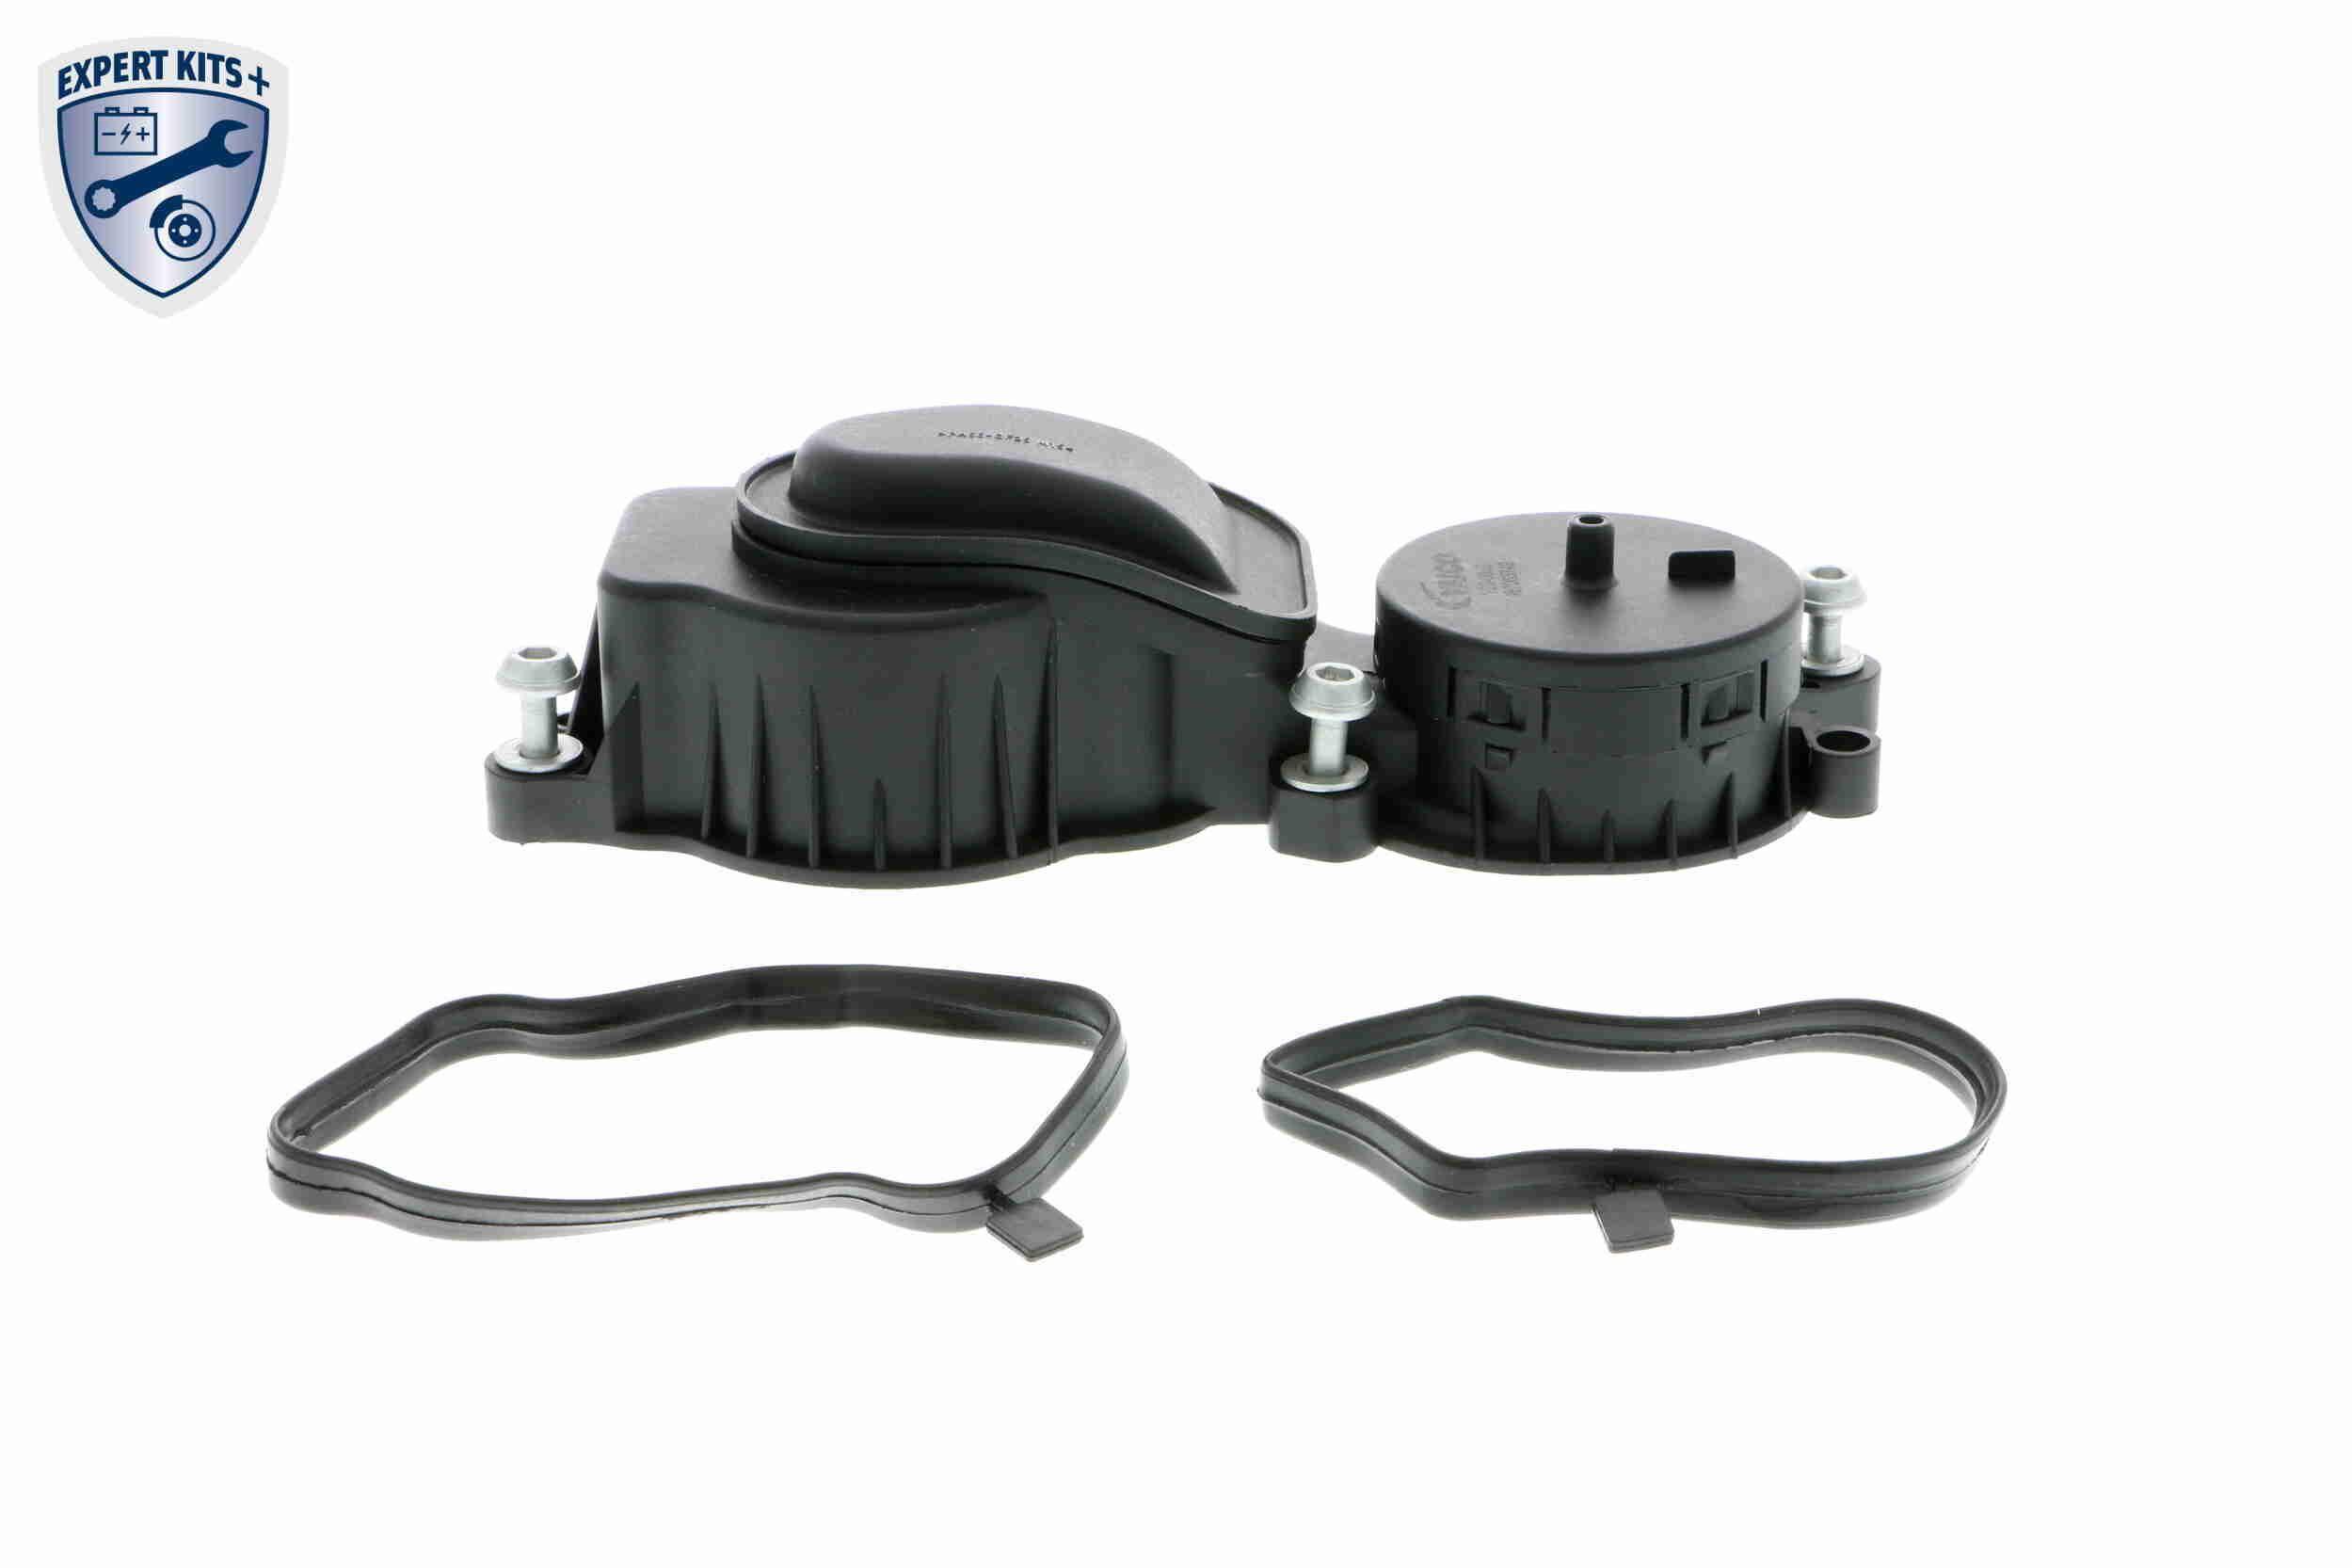 V20-0850 Ventil, Kurbelgehäuseentlüftung VAICO Erfahrung